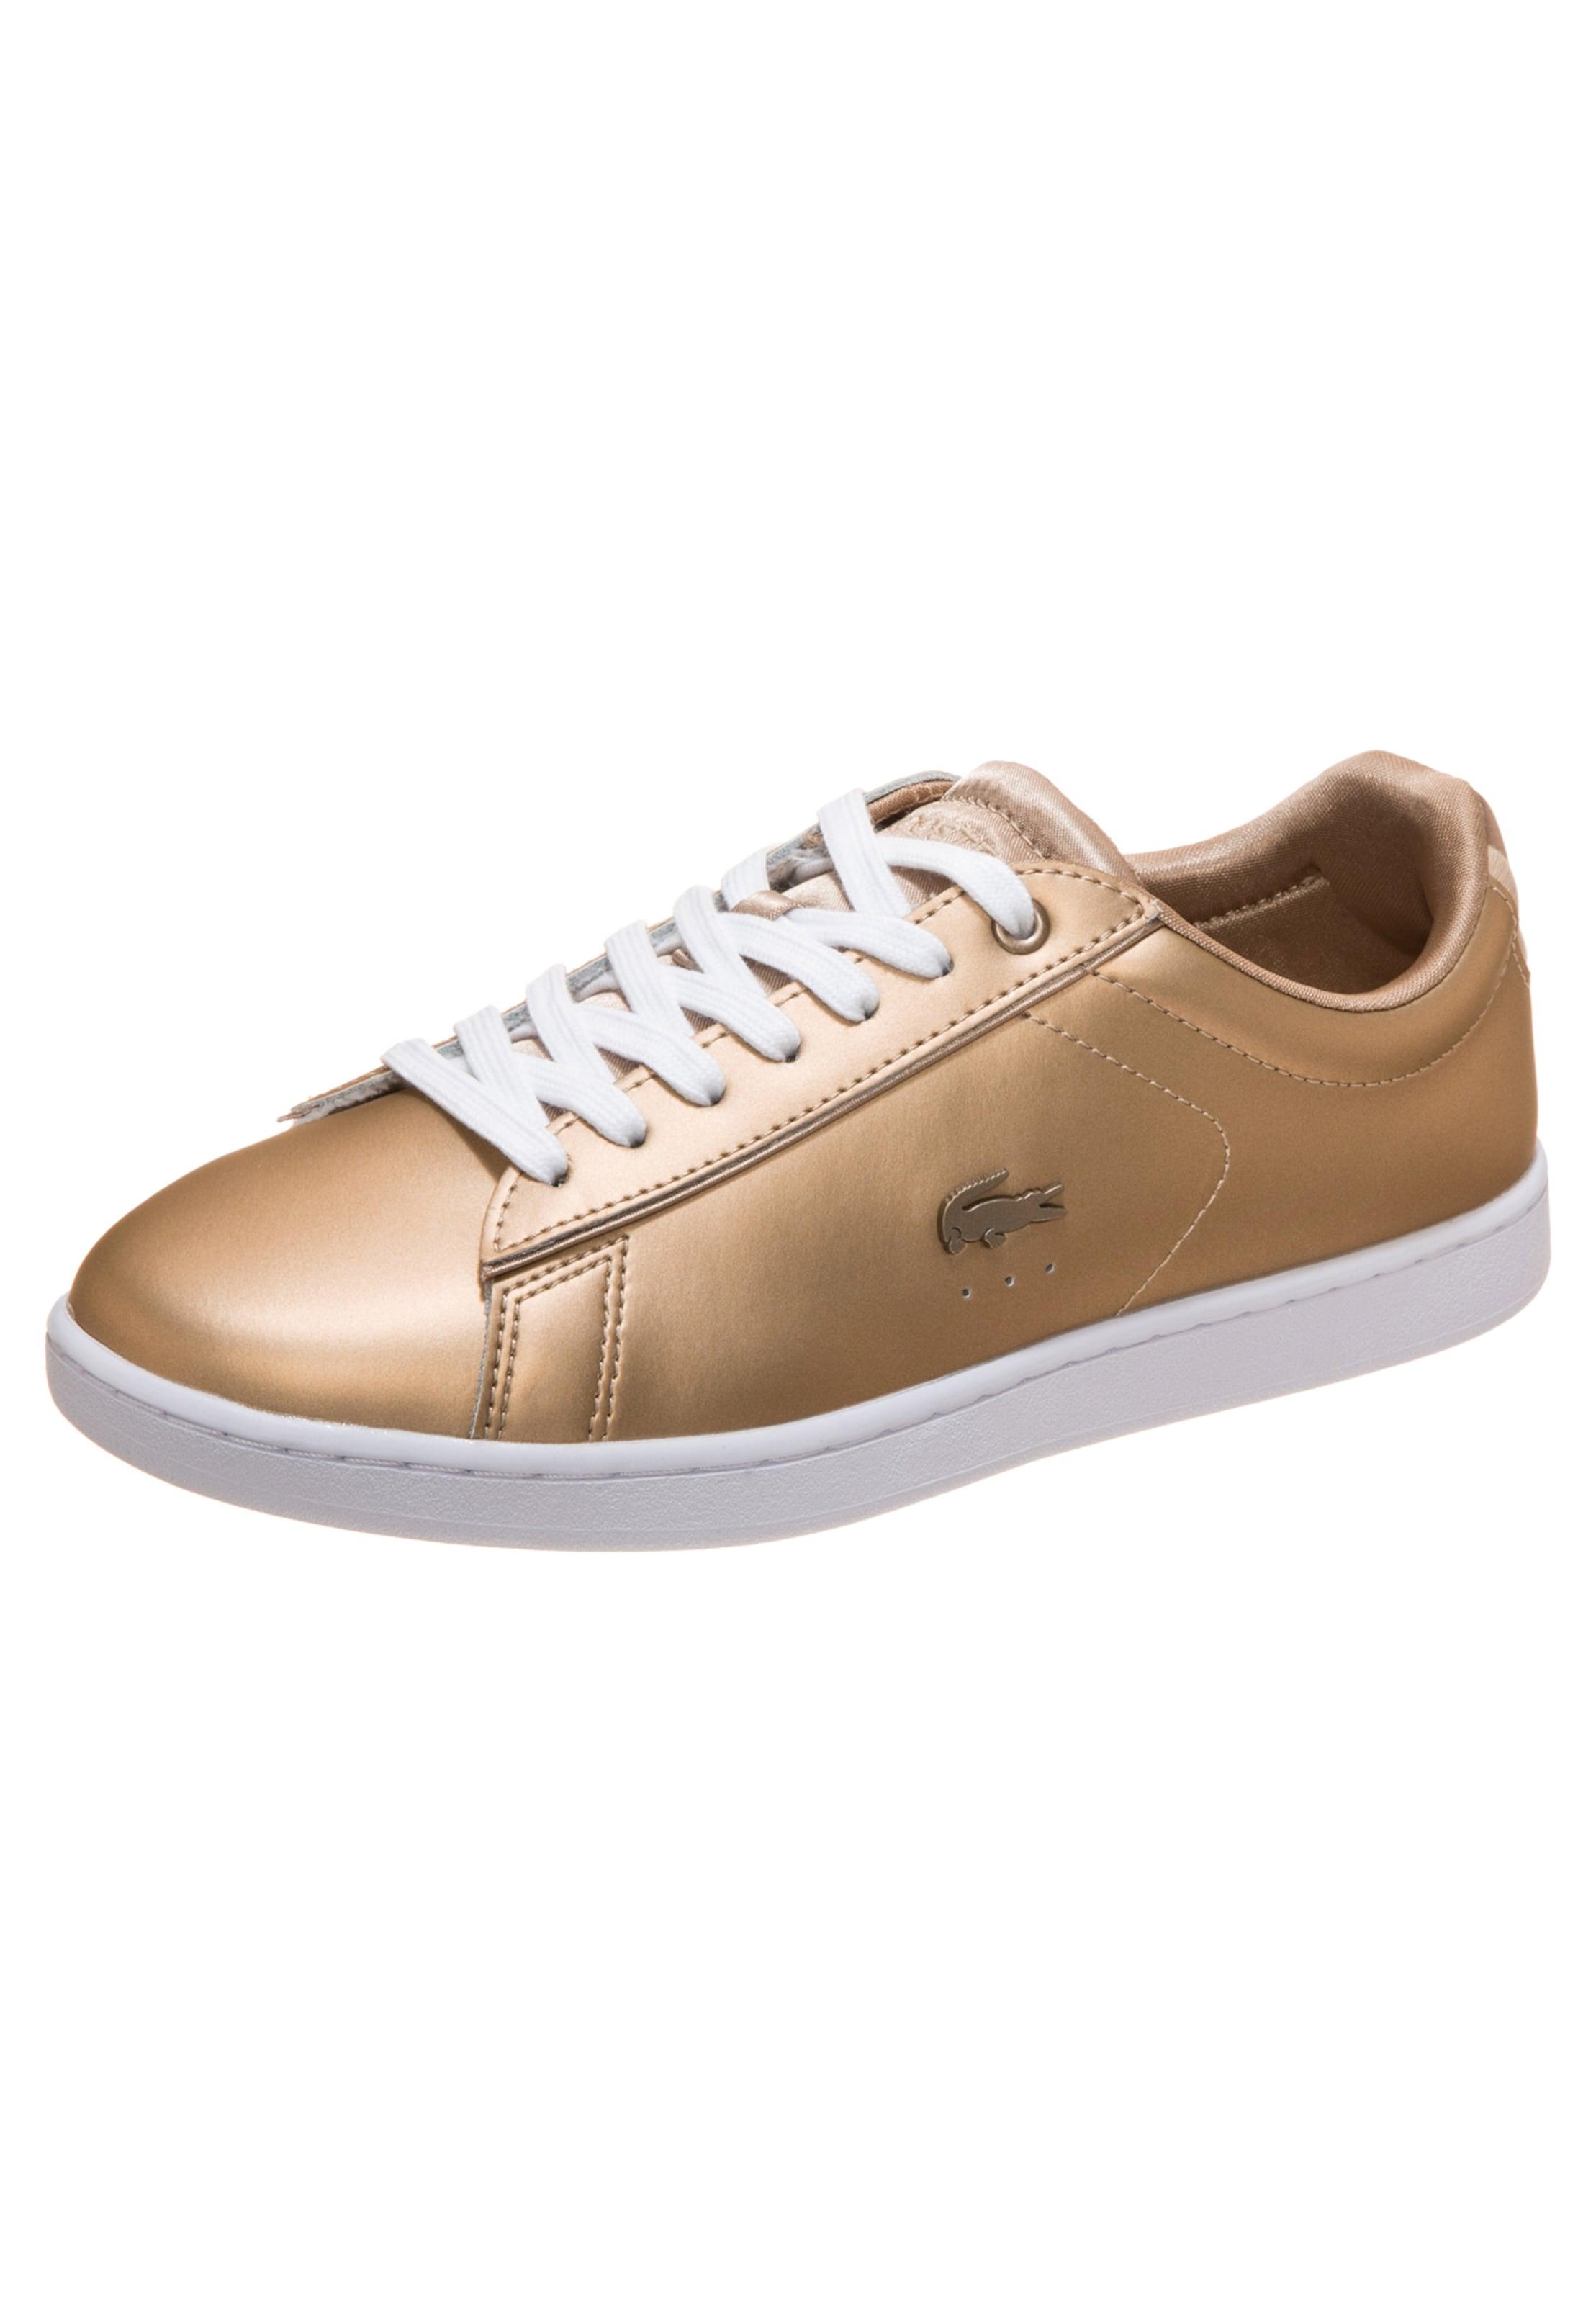 LACOSTE Carnaby Evo Sneaker Damen Hohe Qualität